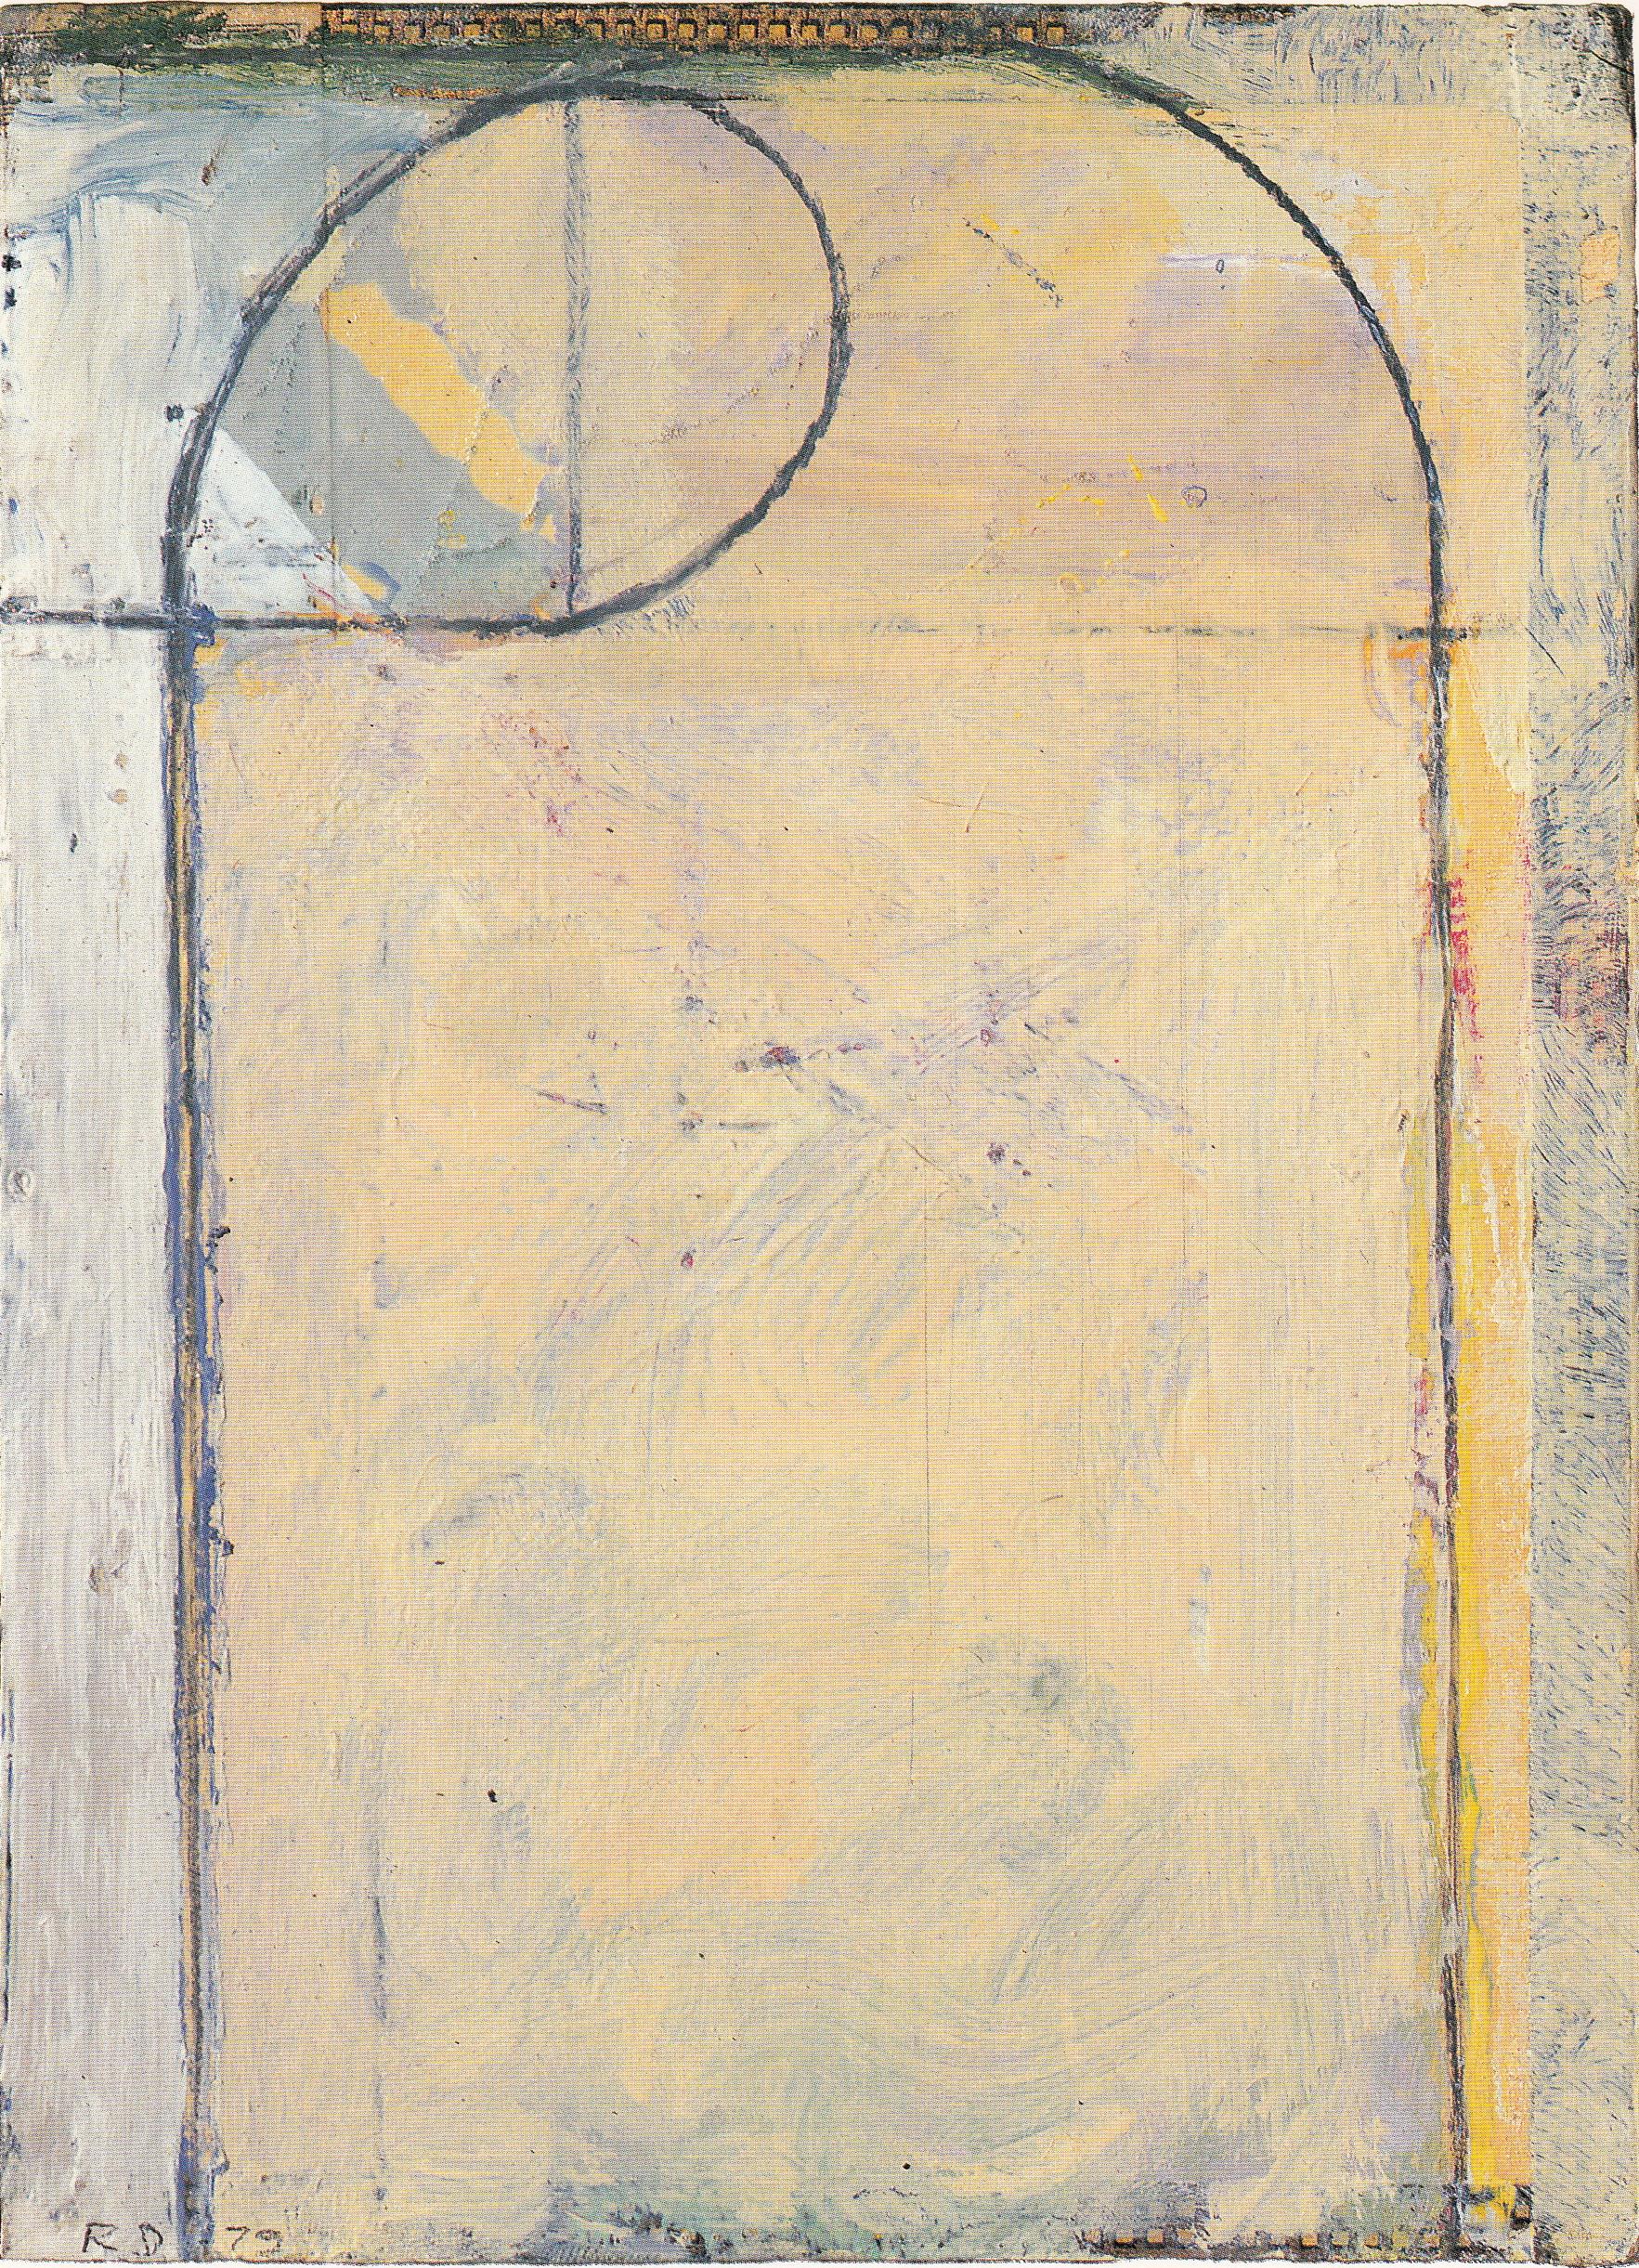 Richard Diebenkorn, Cigar Box Lid #6, oil on wood, 1979